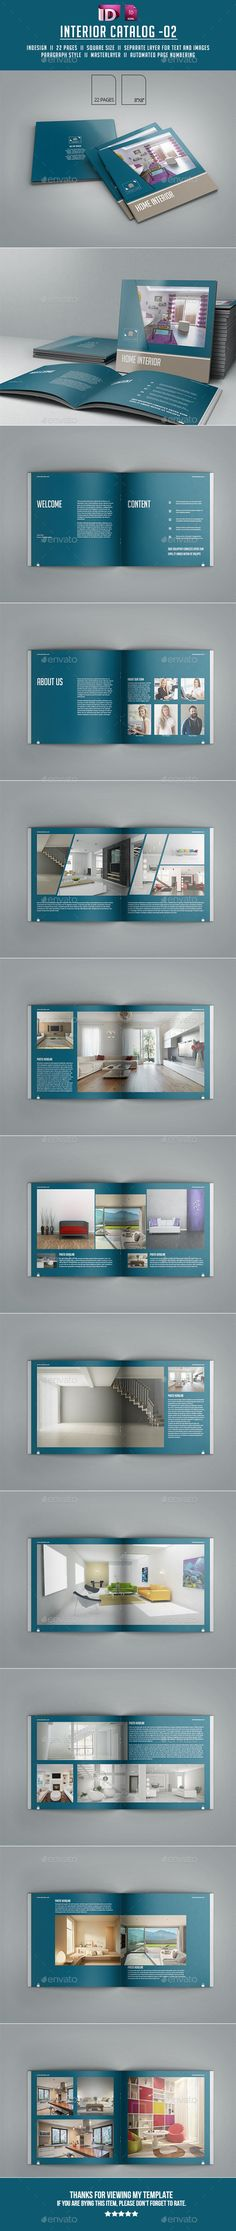 Interior Catalog Template #design Download: http://graphicriver.net/item/interior-catalog-02/11827117?ref=ksioks